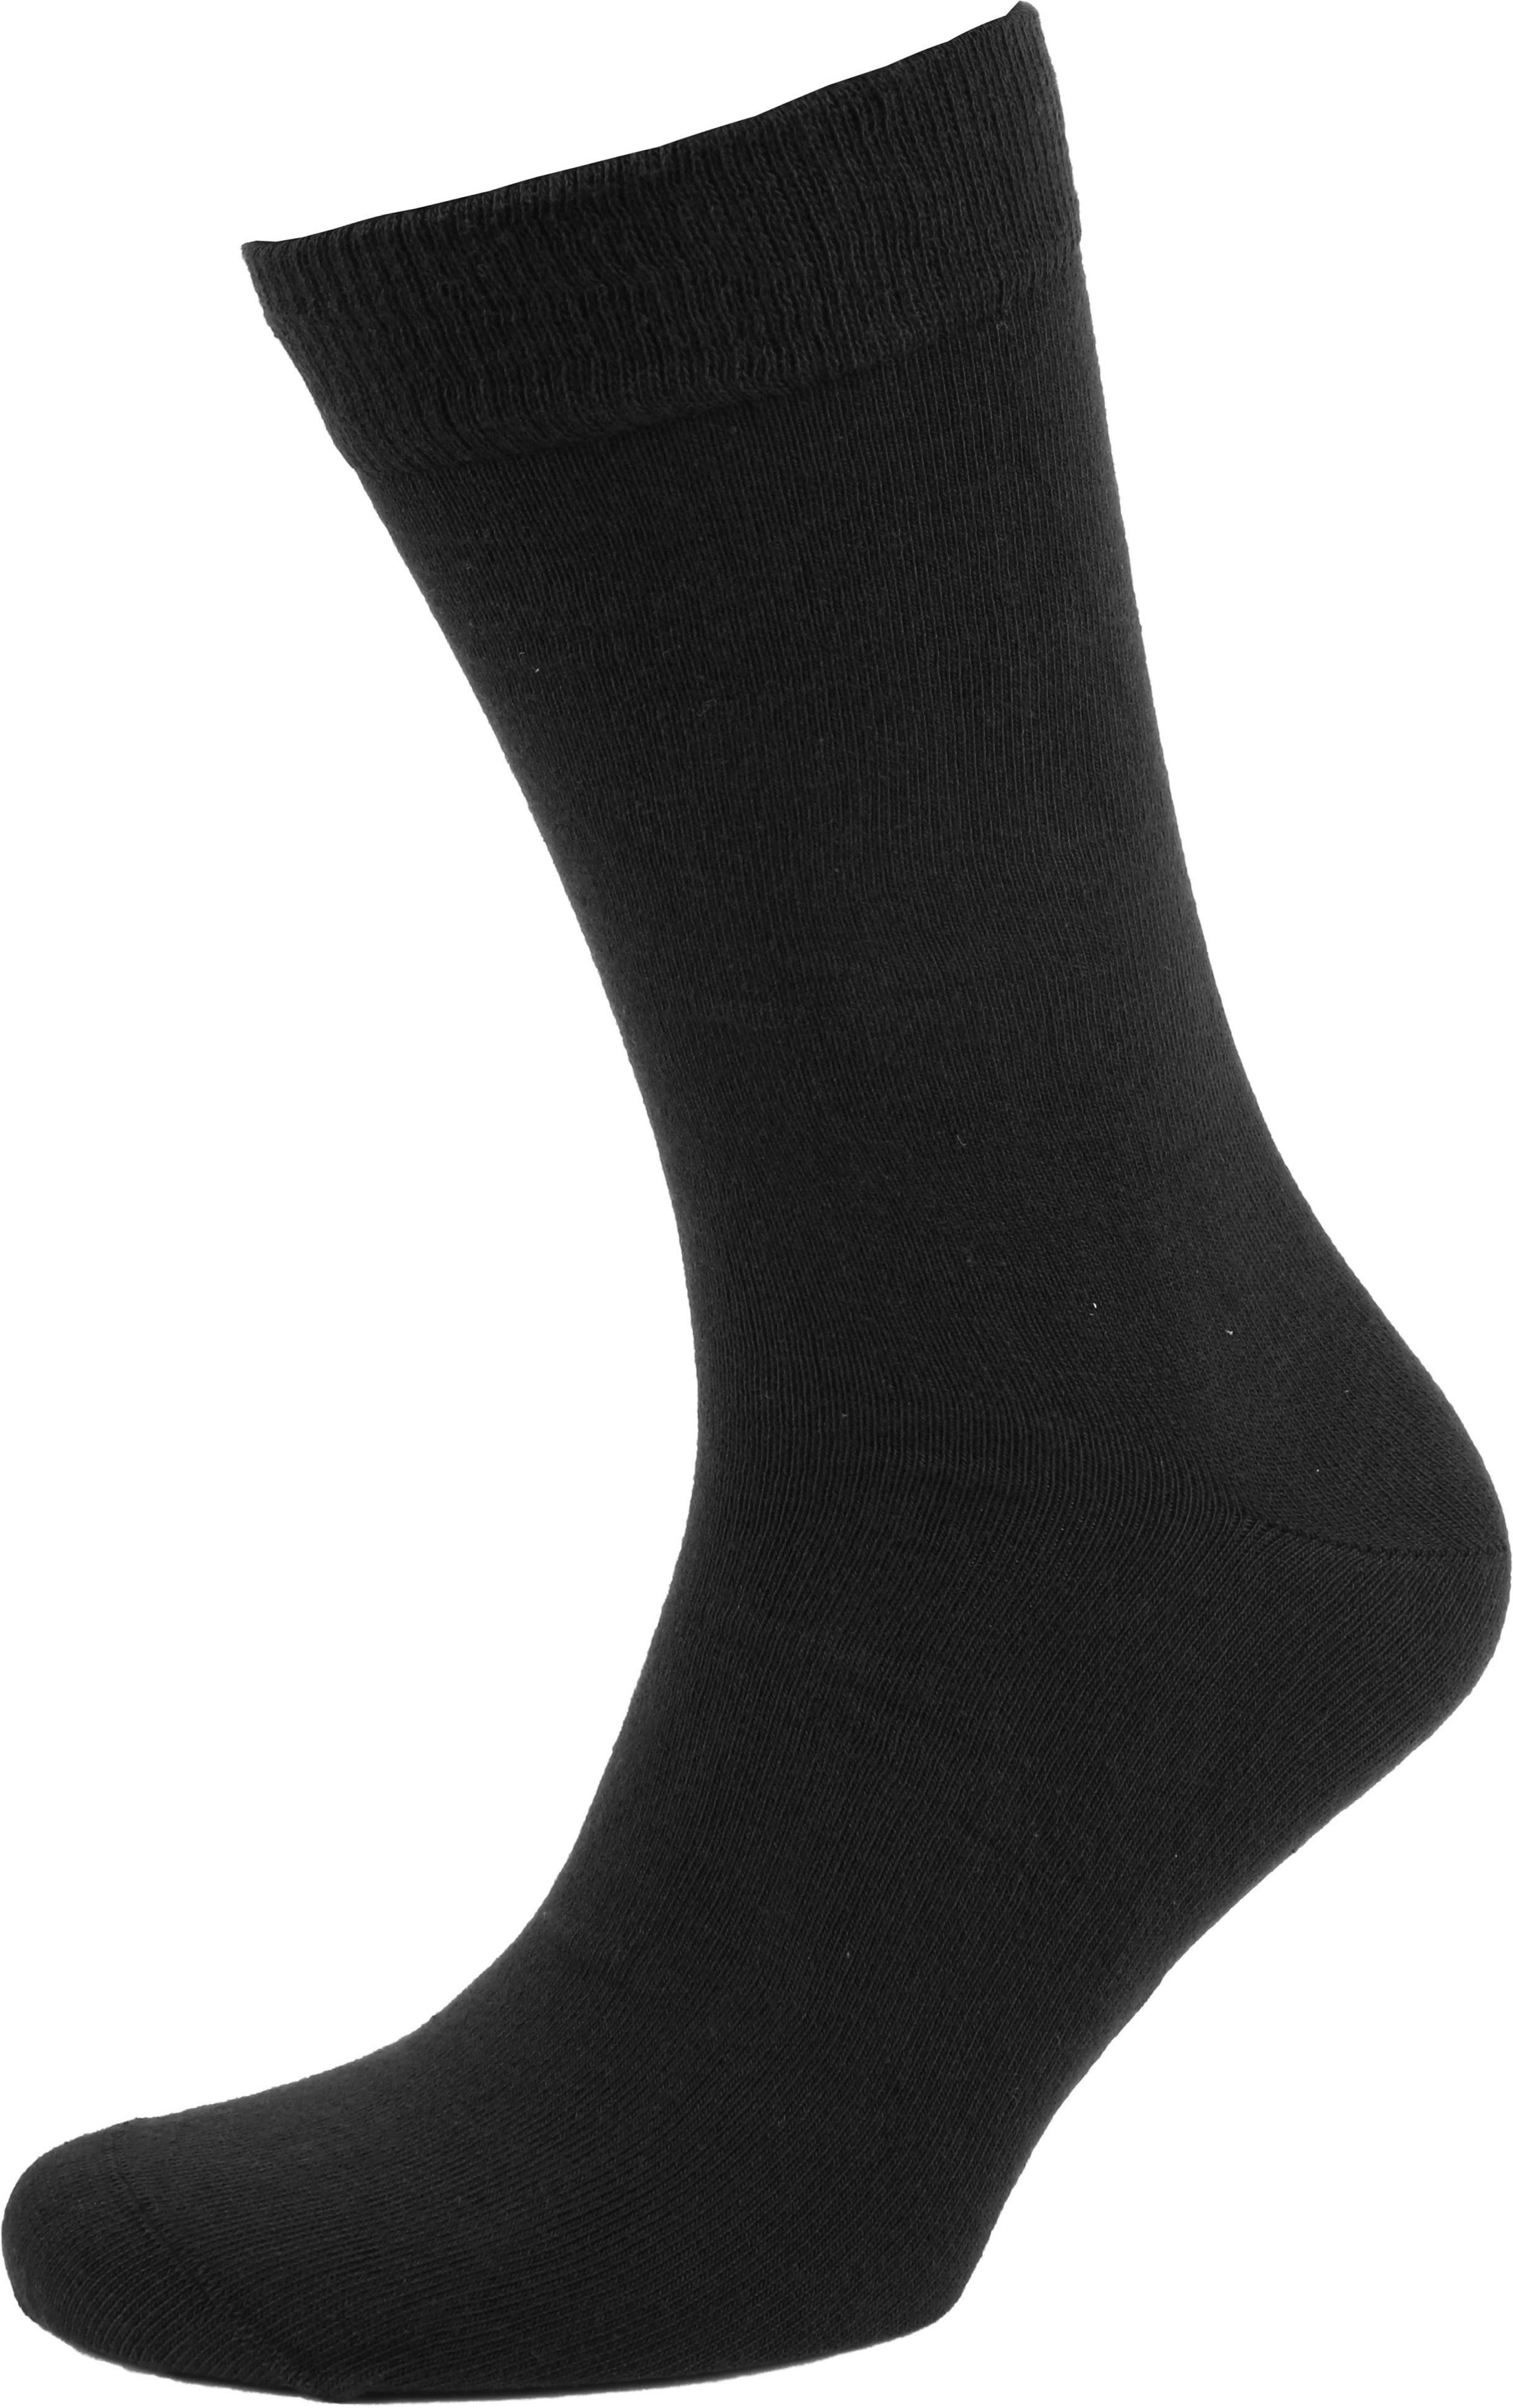 Suitable Bio-Baumwolle Socken Schwarz 6-Pack foto 2